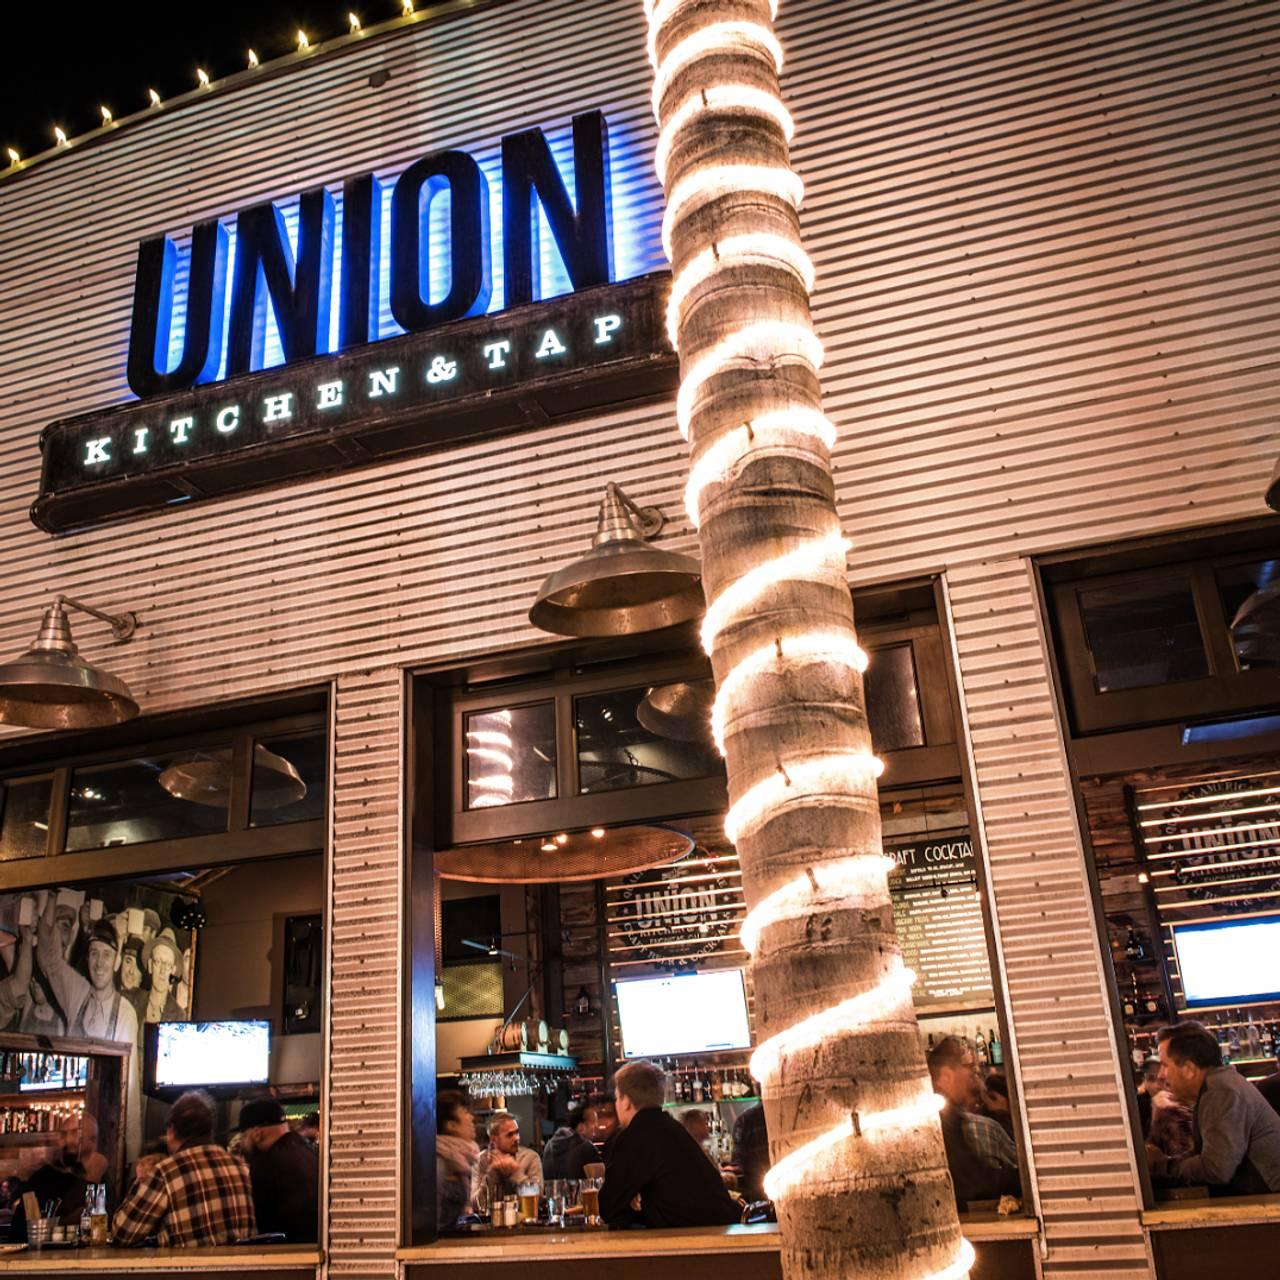 UNION Kitchen & Tap Restaurant - Encinitas, CA | OpenTable